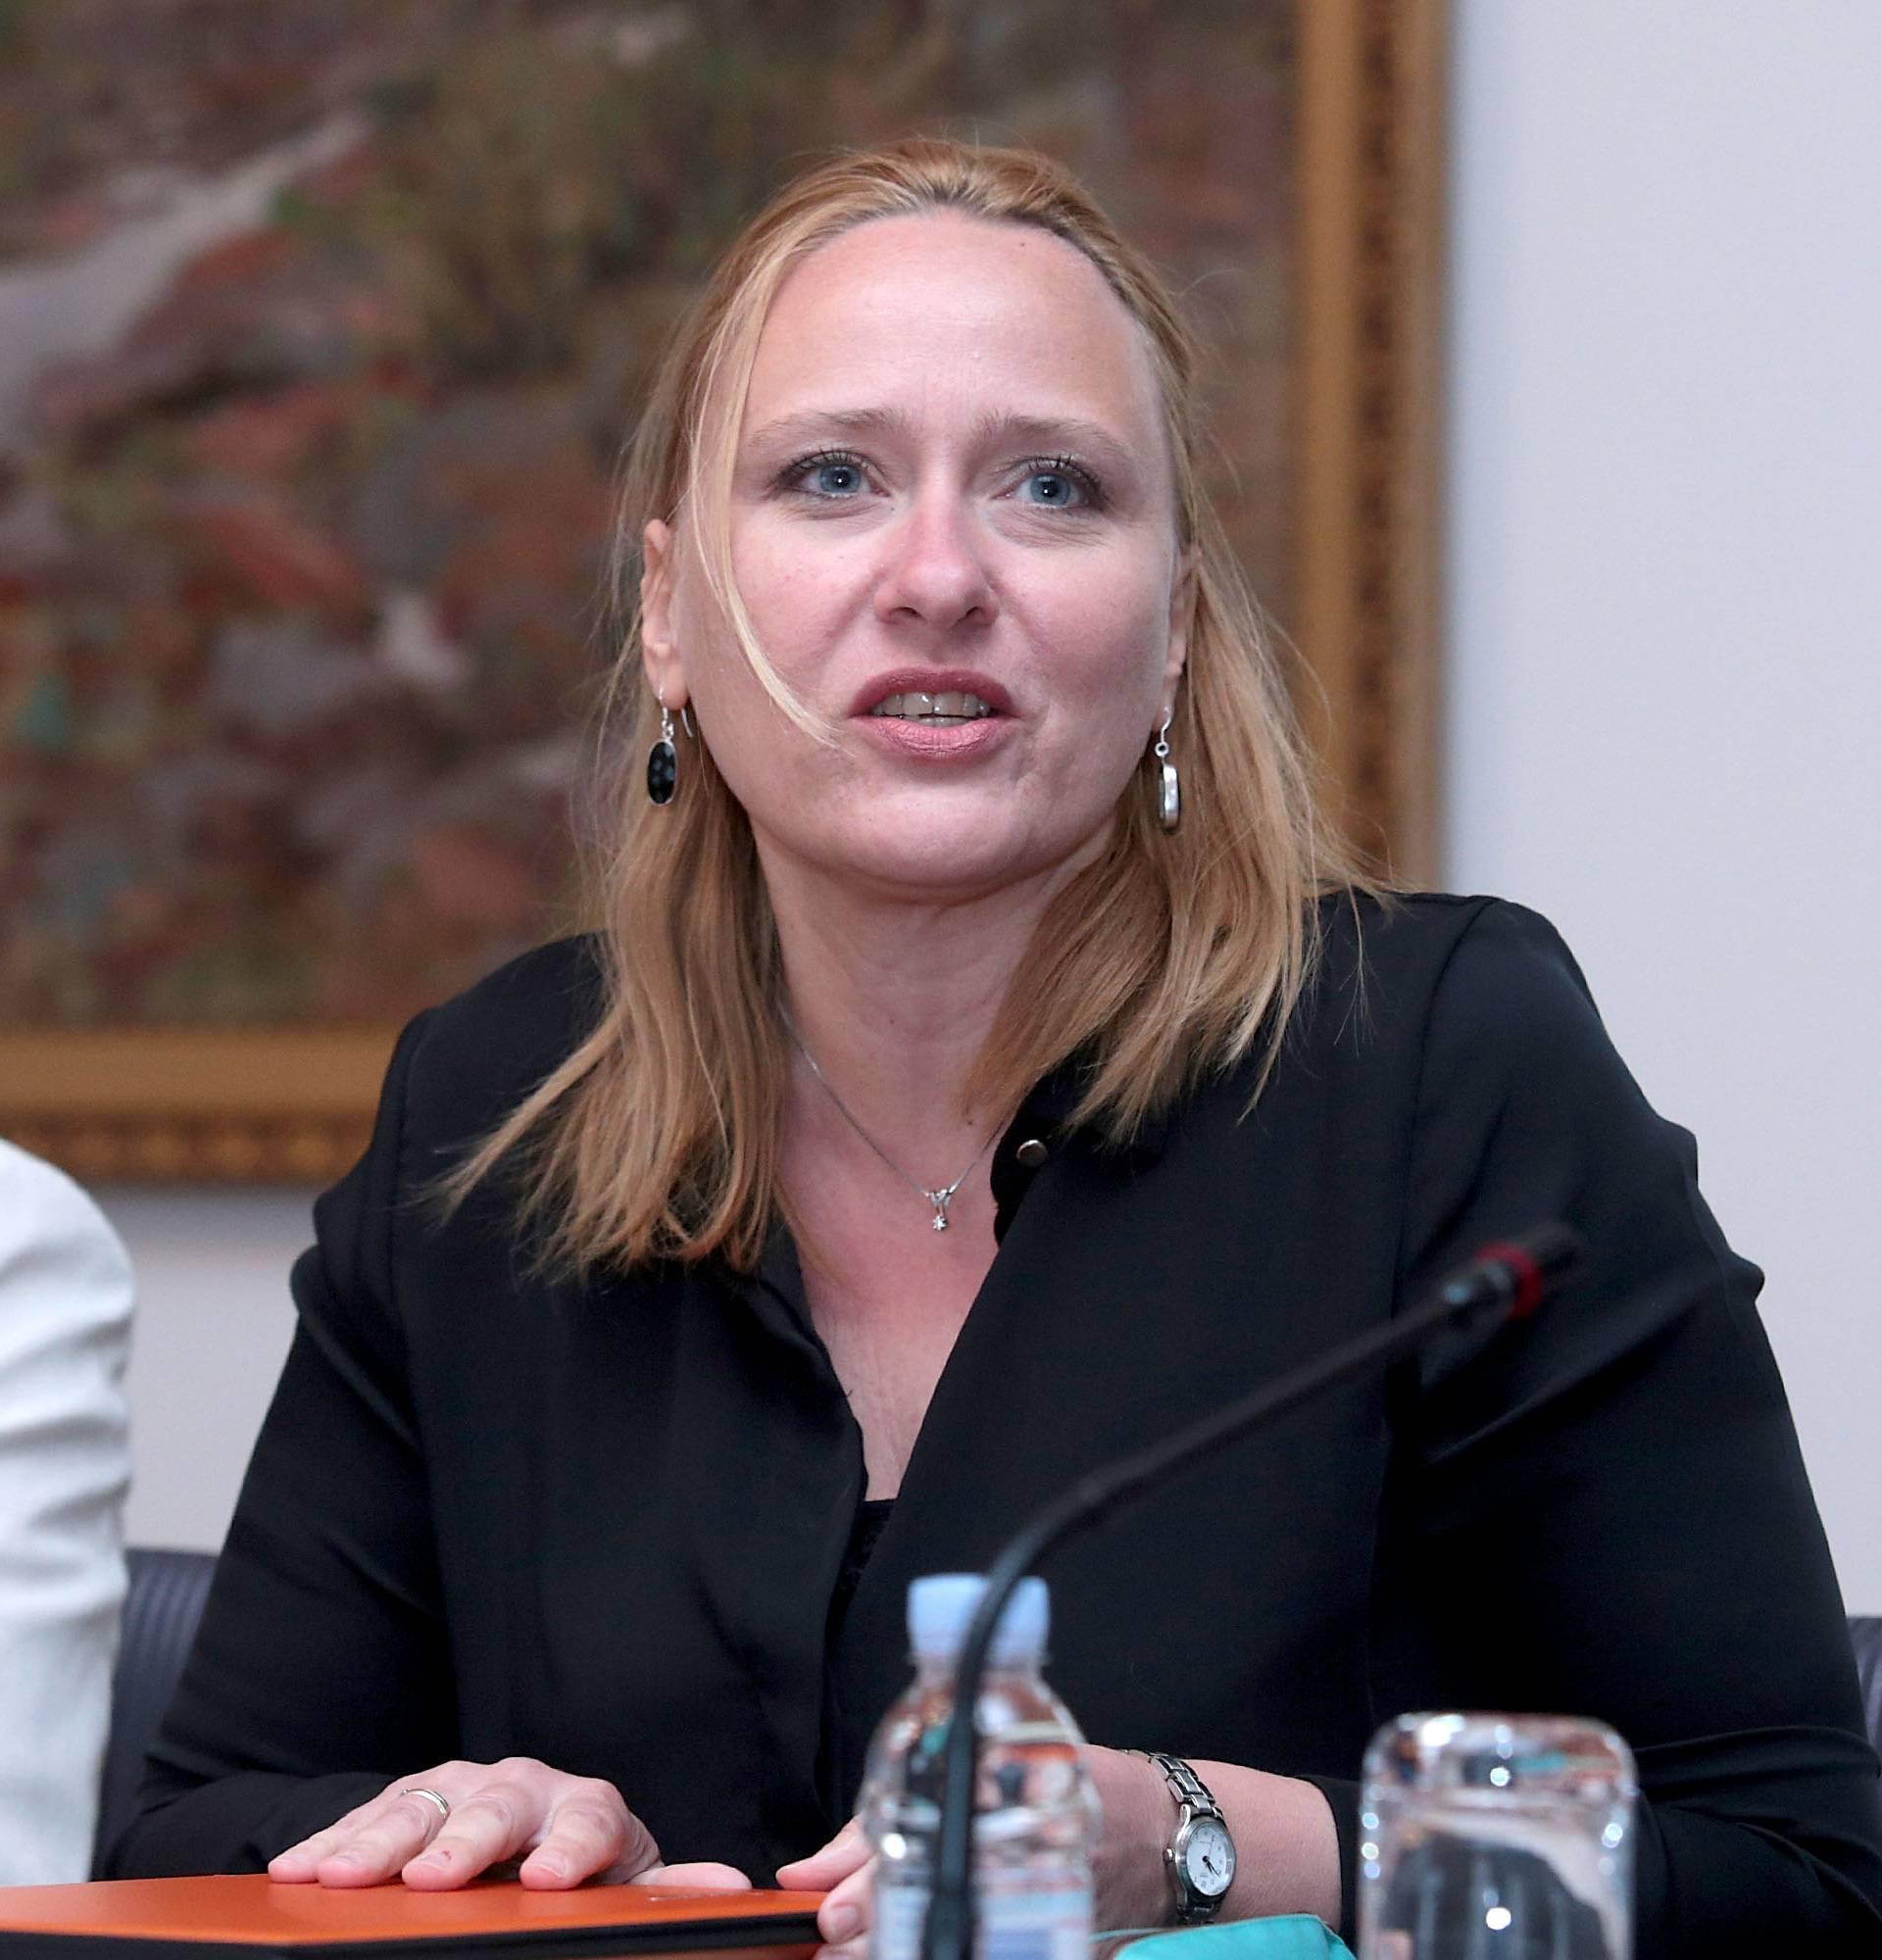 Pravobraniteljica: Skoro petina mladih se ne obrazuje niti radi